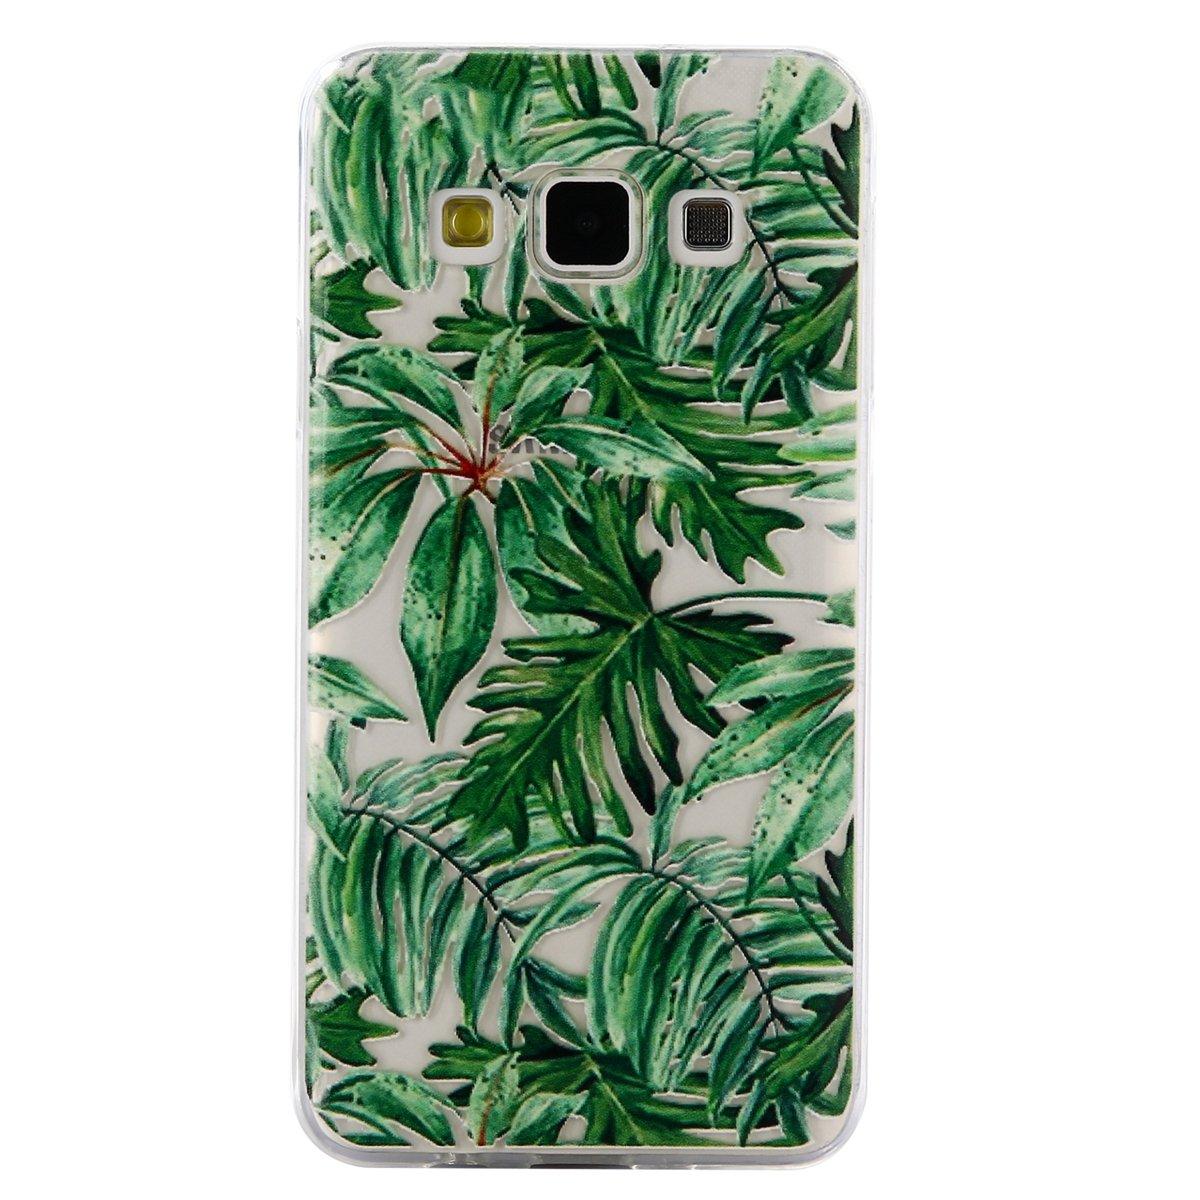 Ultra Slim Custodia Trasparente Silicone Morbido Shock-Absorption Cover per Samsung Galaxy A3 2015-Lace Pattern SainCat Custodia Galaxy A3 2015